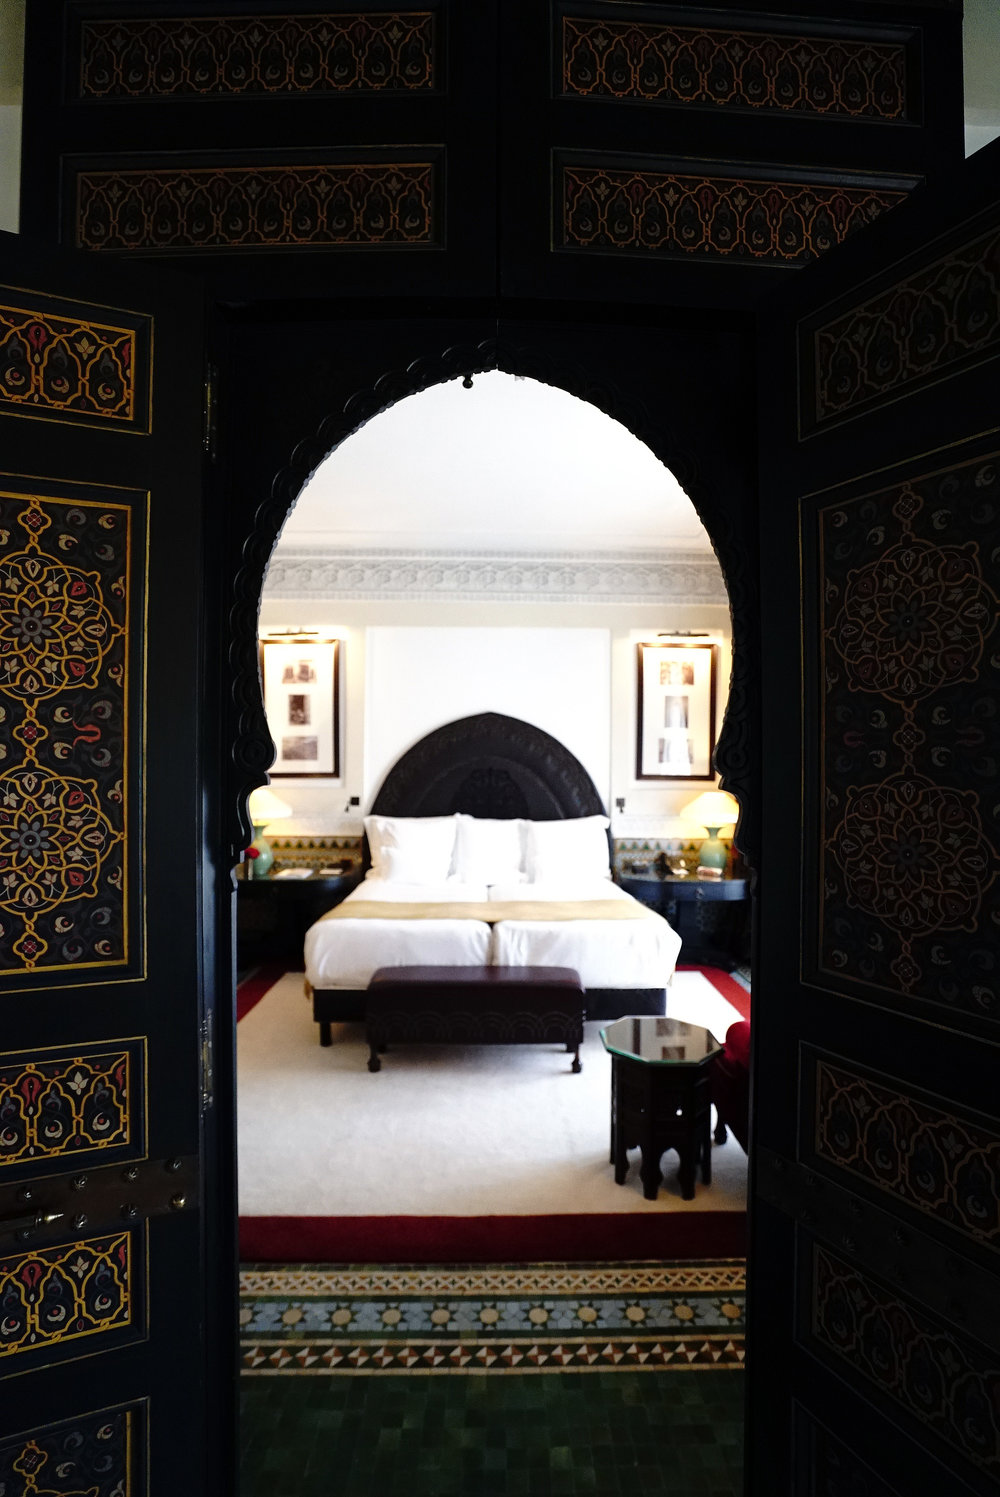 La Mamounia Morocco Room.jpg